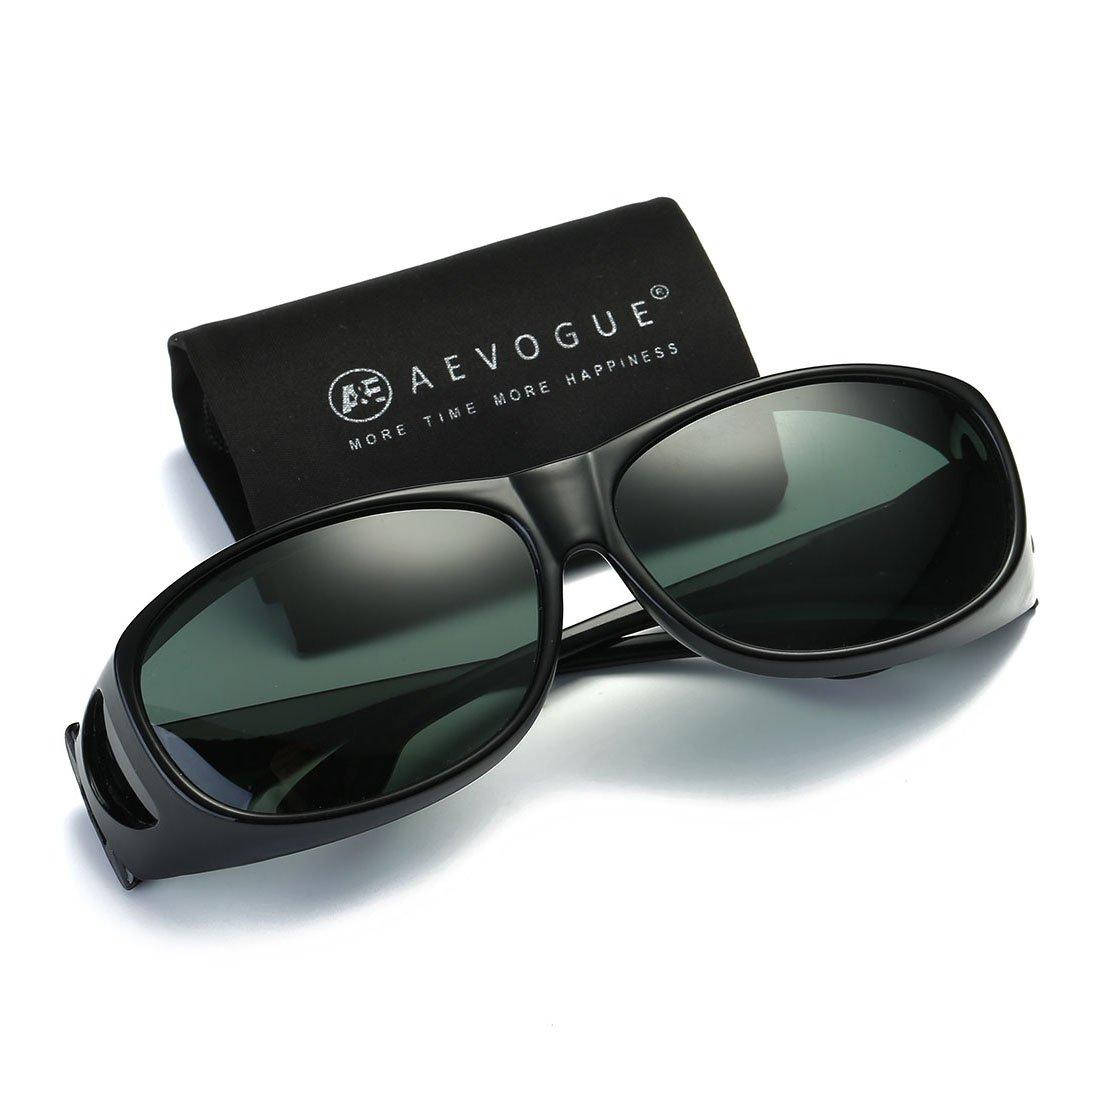 Mens Glasses Sunglasses Glass Safety Over Polarized The Prescription Ae0509 Aevogue 1JcTF3Kl